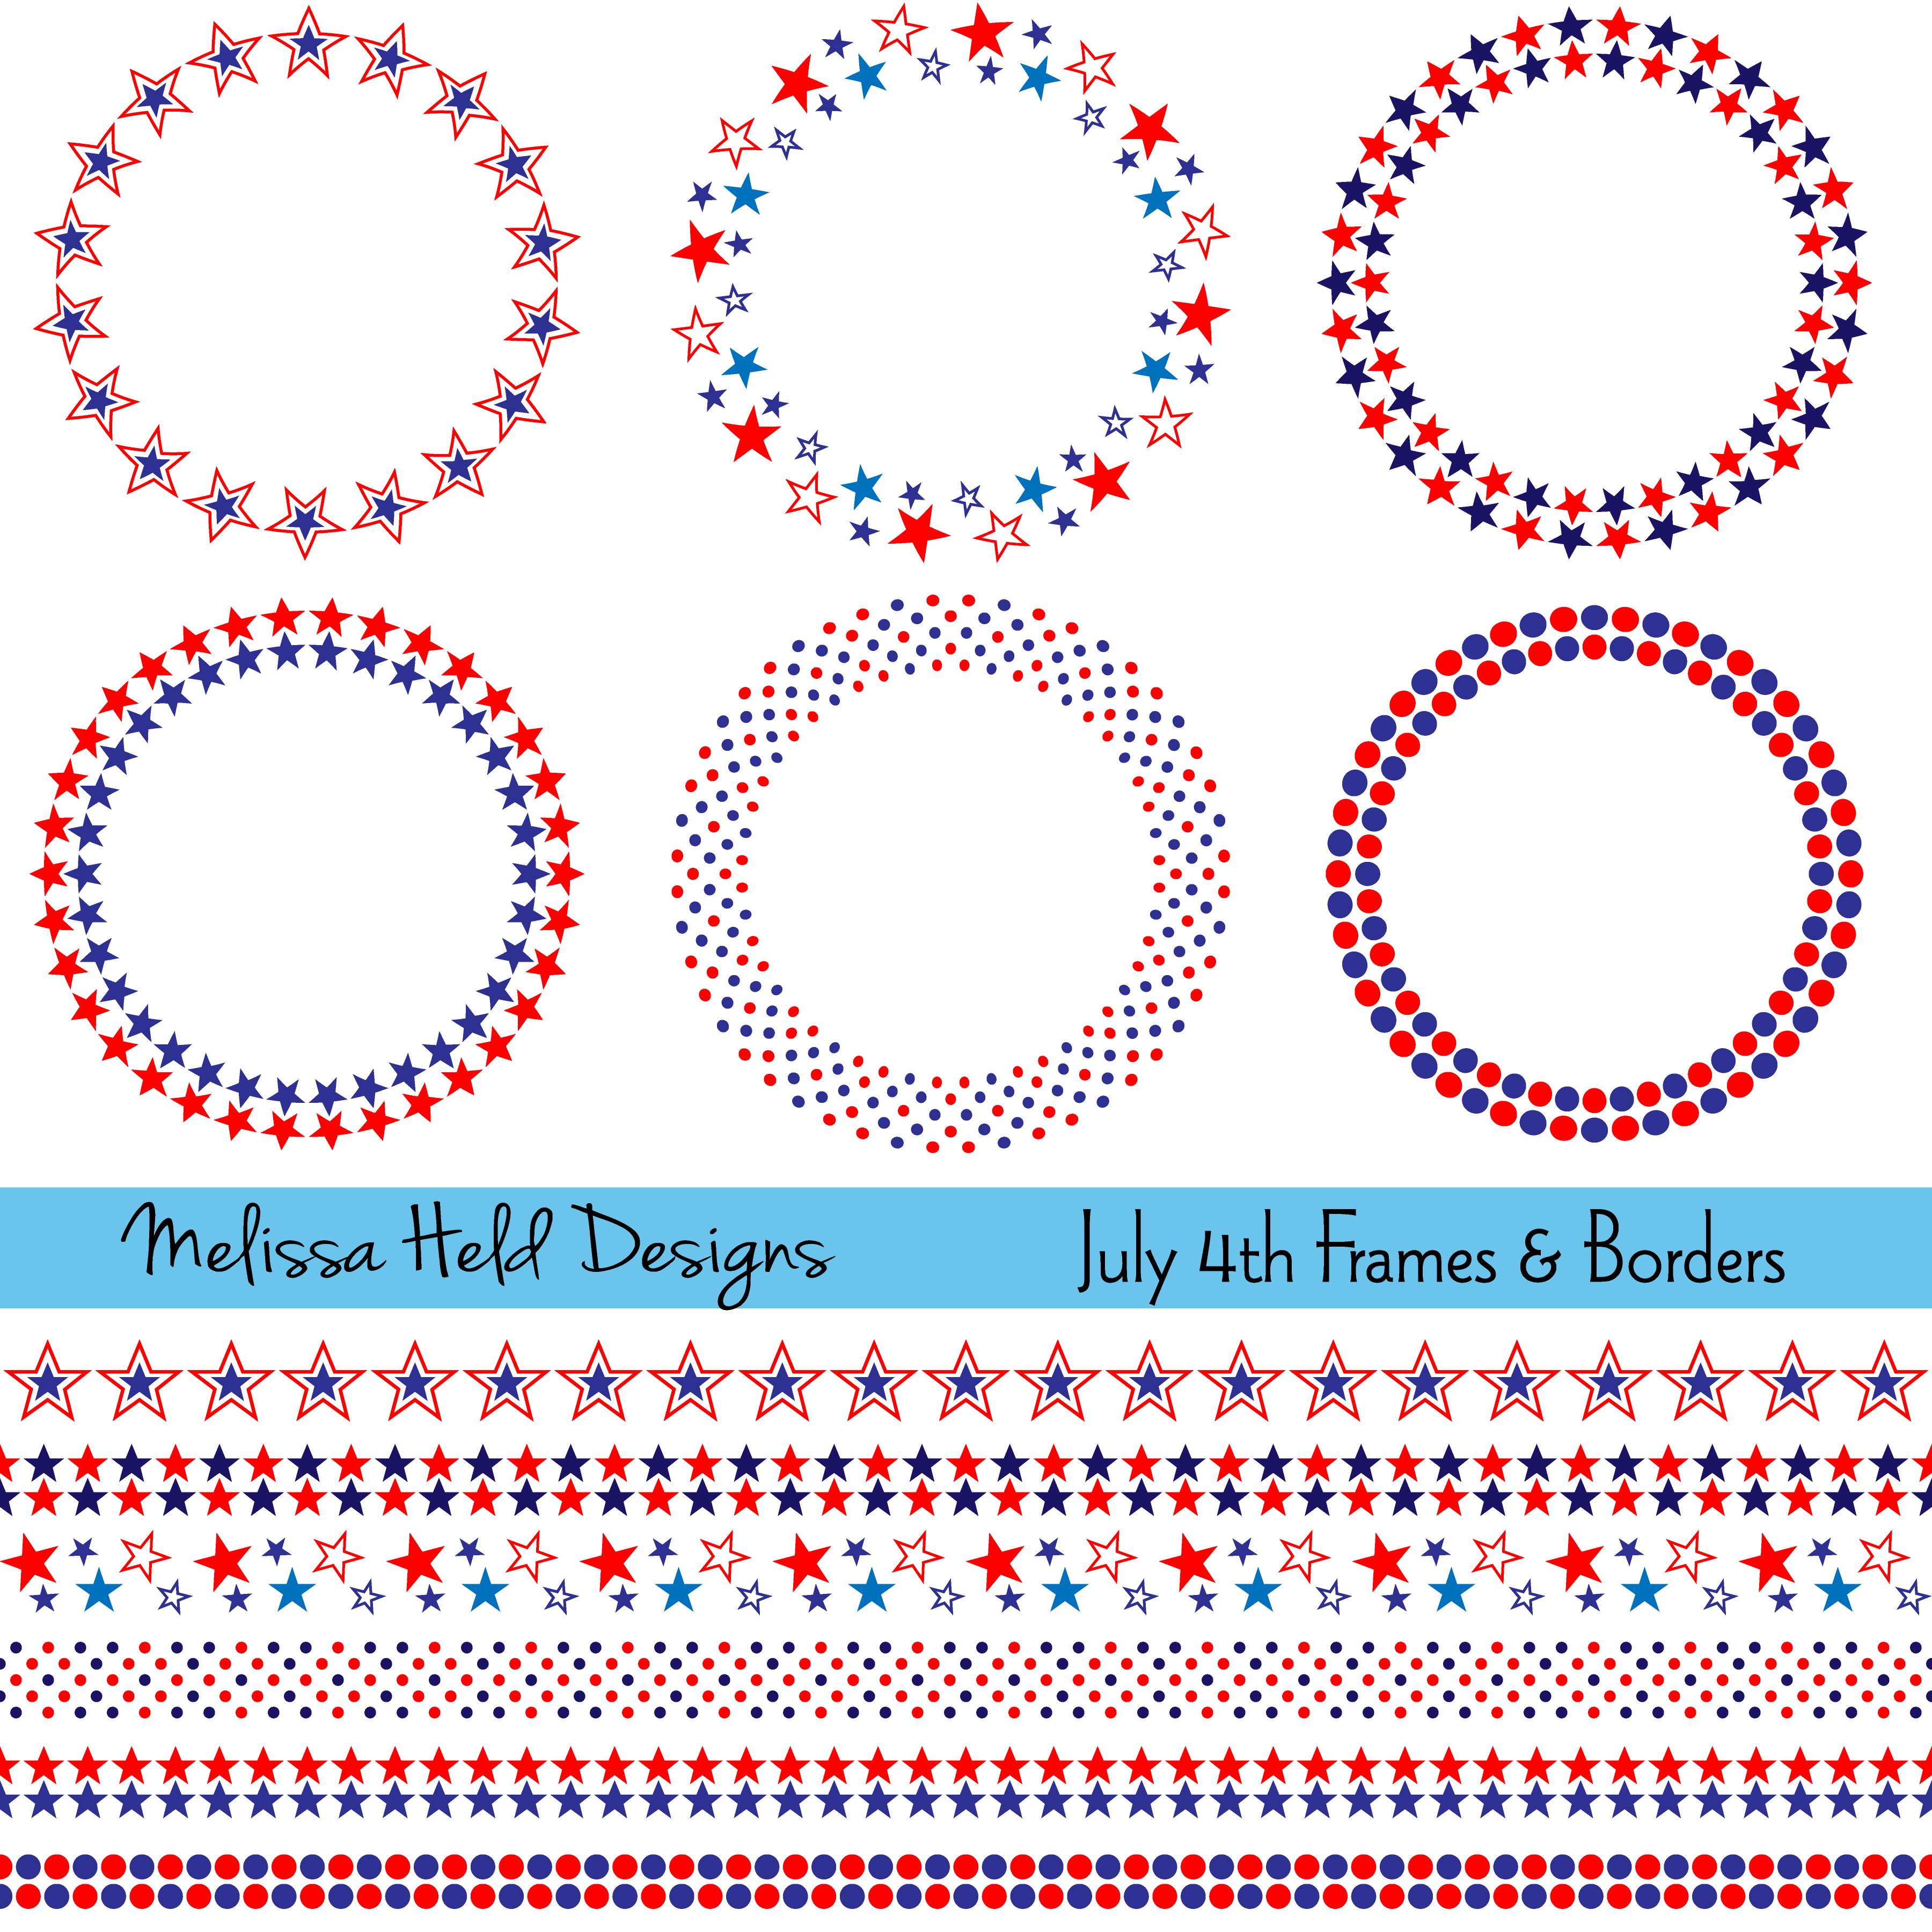 July 4th Frames And Borders Border Pattern Dot Painting Circle Frames